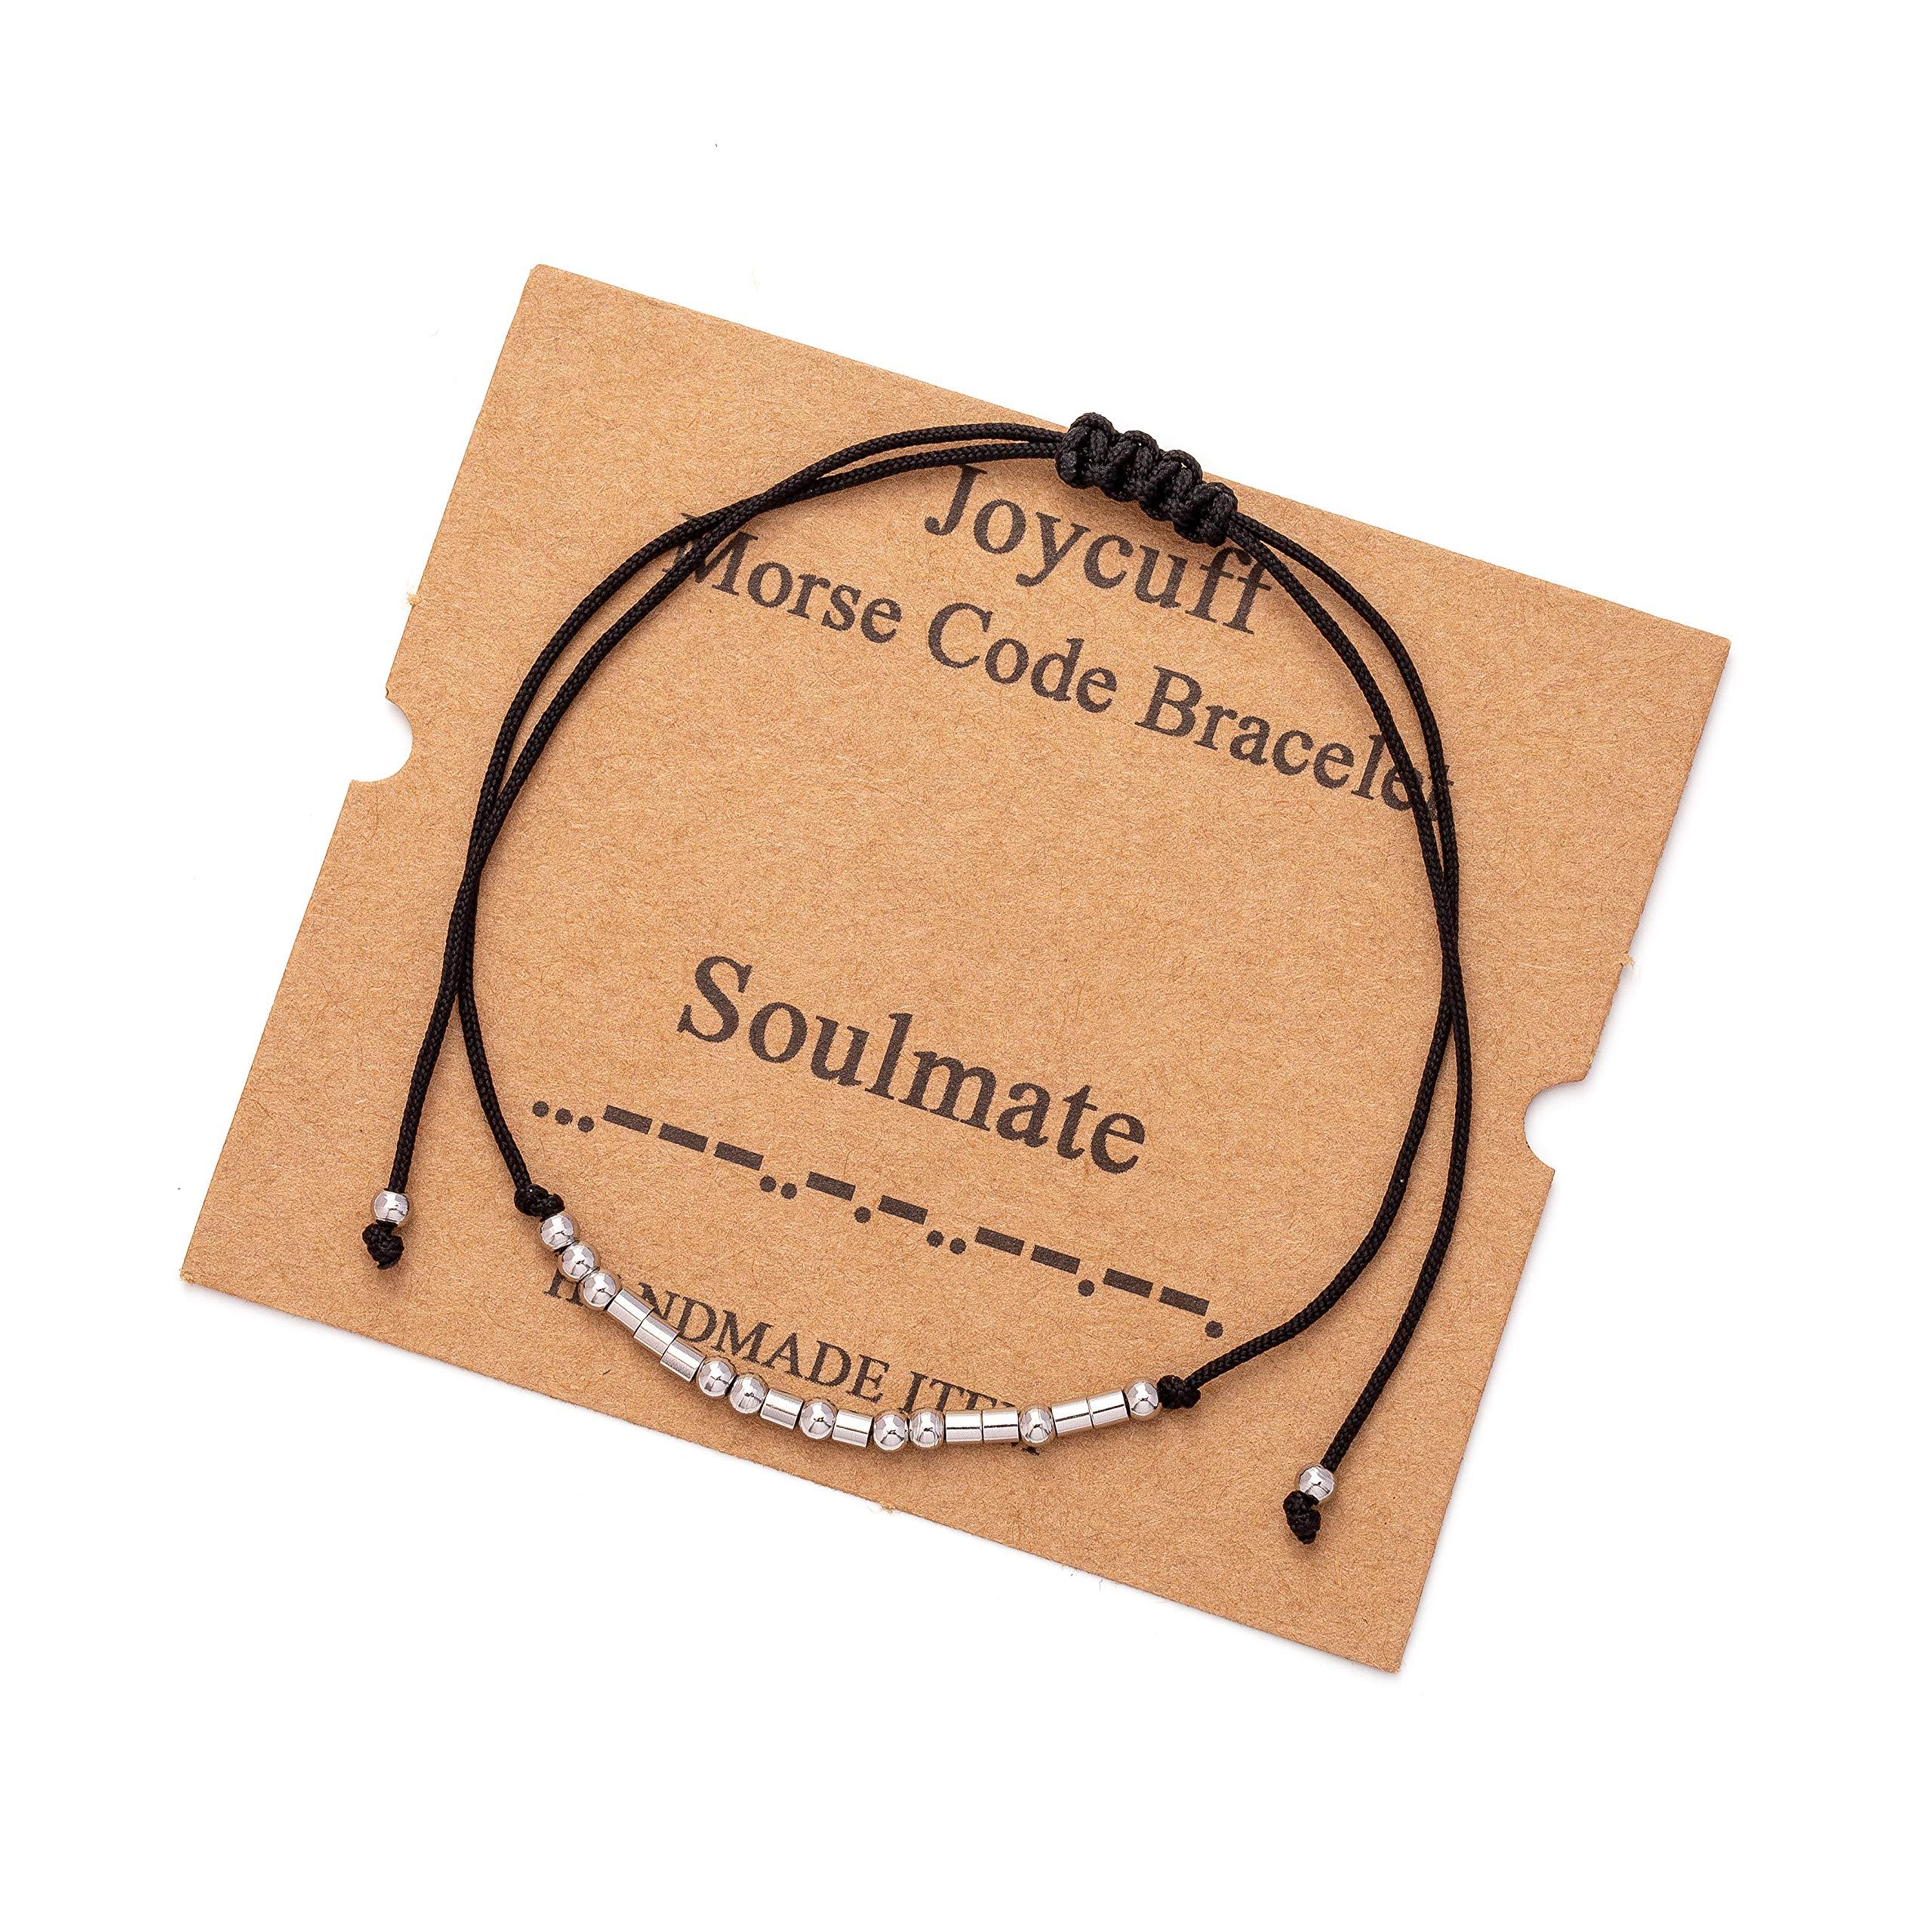 Joycuff Morse Code Bracelets for Women Mom Daughter Sister Inspirational Encouragement Dainty Bangle Birthday Gifts Handmade Jewelry for Her Teen Girls Friend Adjustable Wrap Bracelet